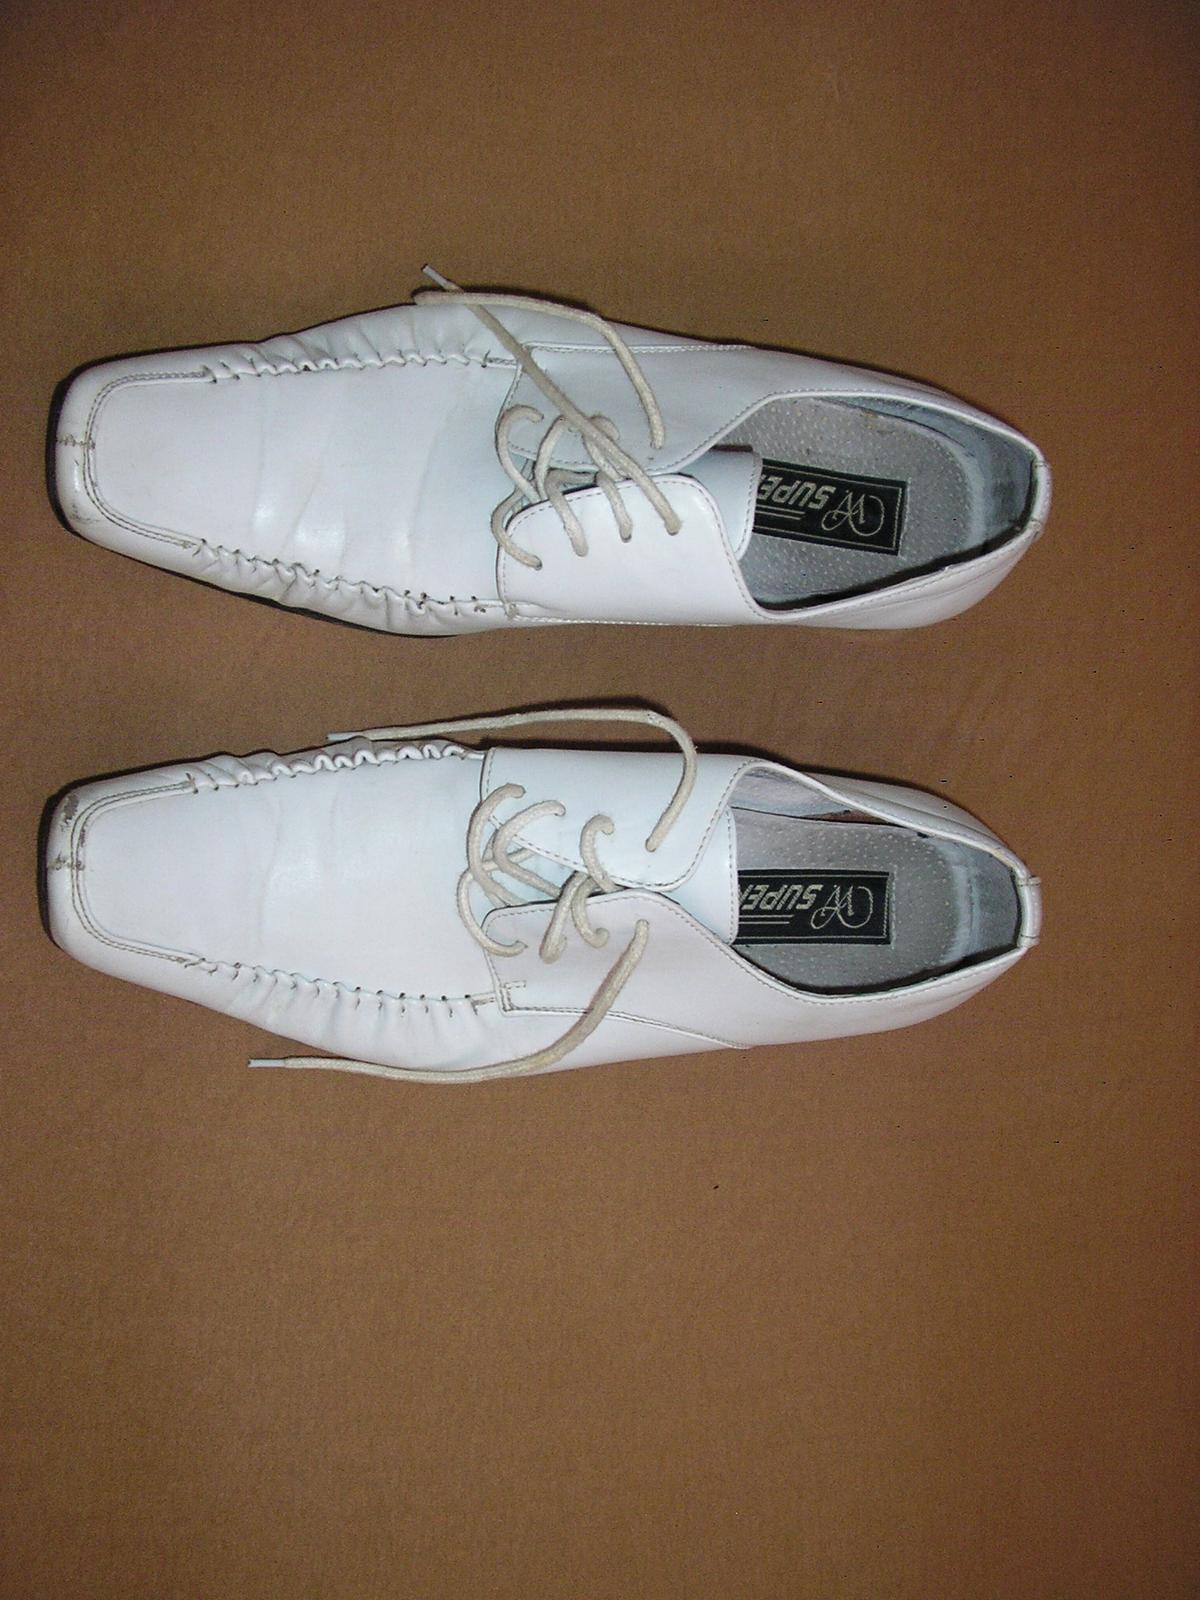 1525. W Super pánske kož. topánky č. 41 - Obrázok č. 1